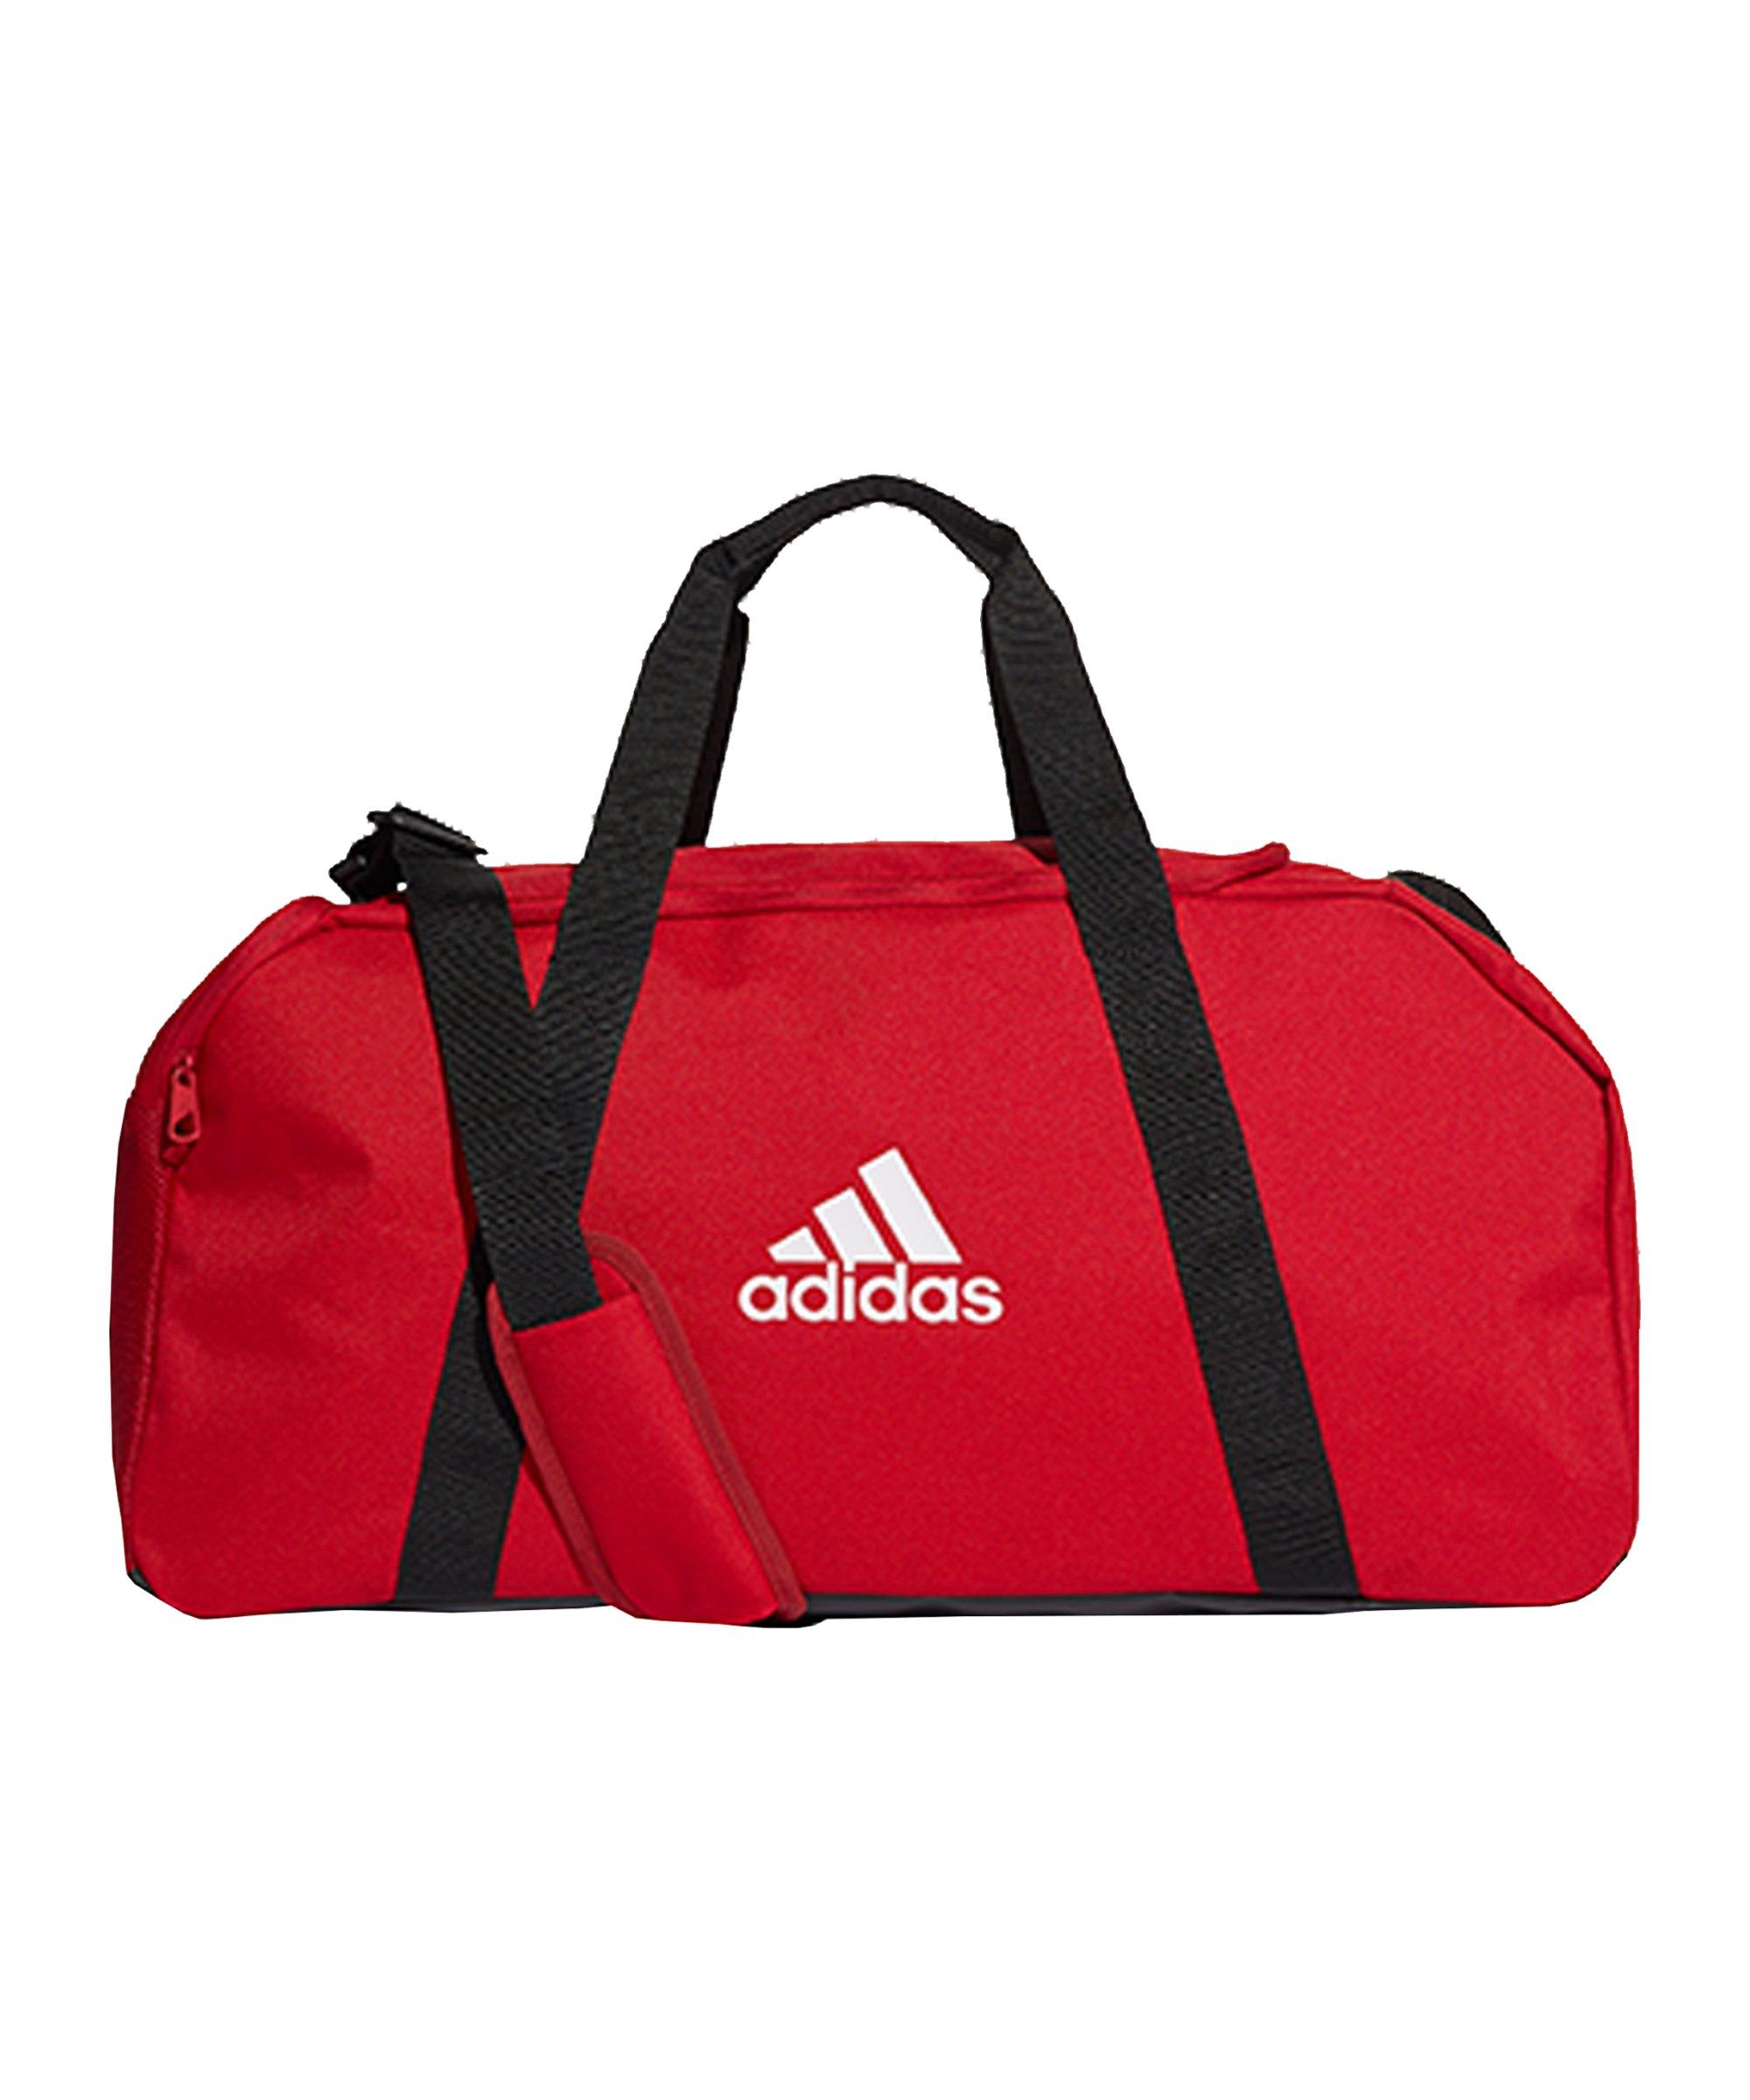 adidas Tiro Duffle Bag Gr. M Rot Weiss - rot